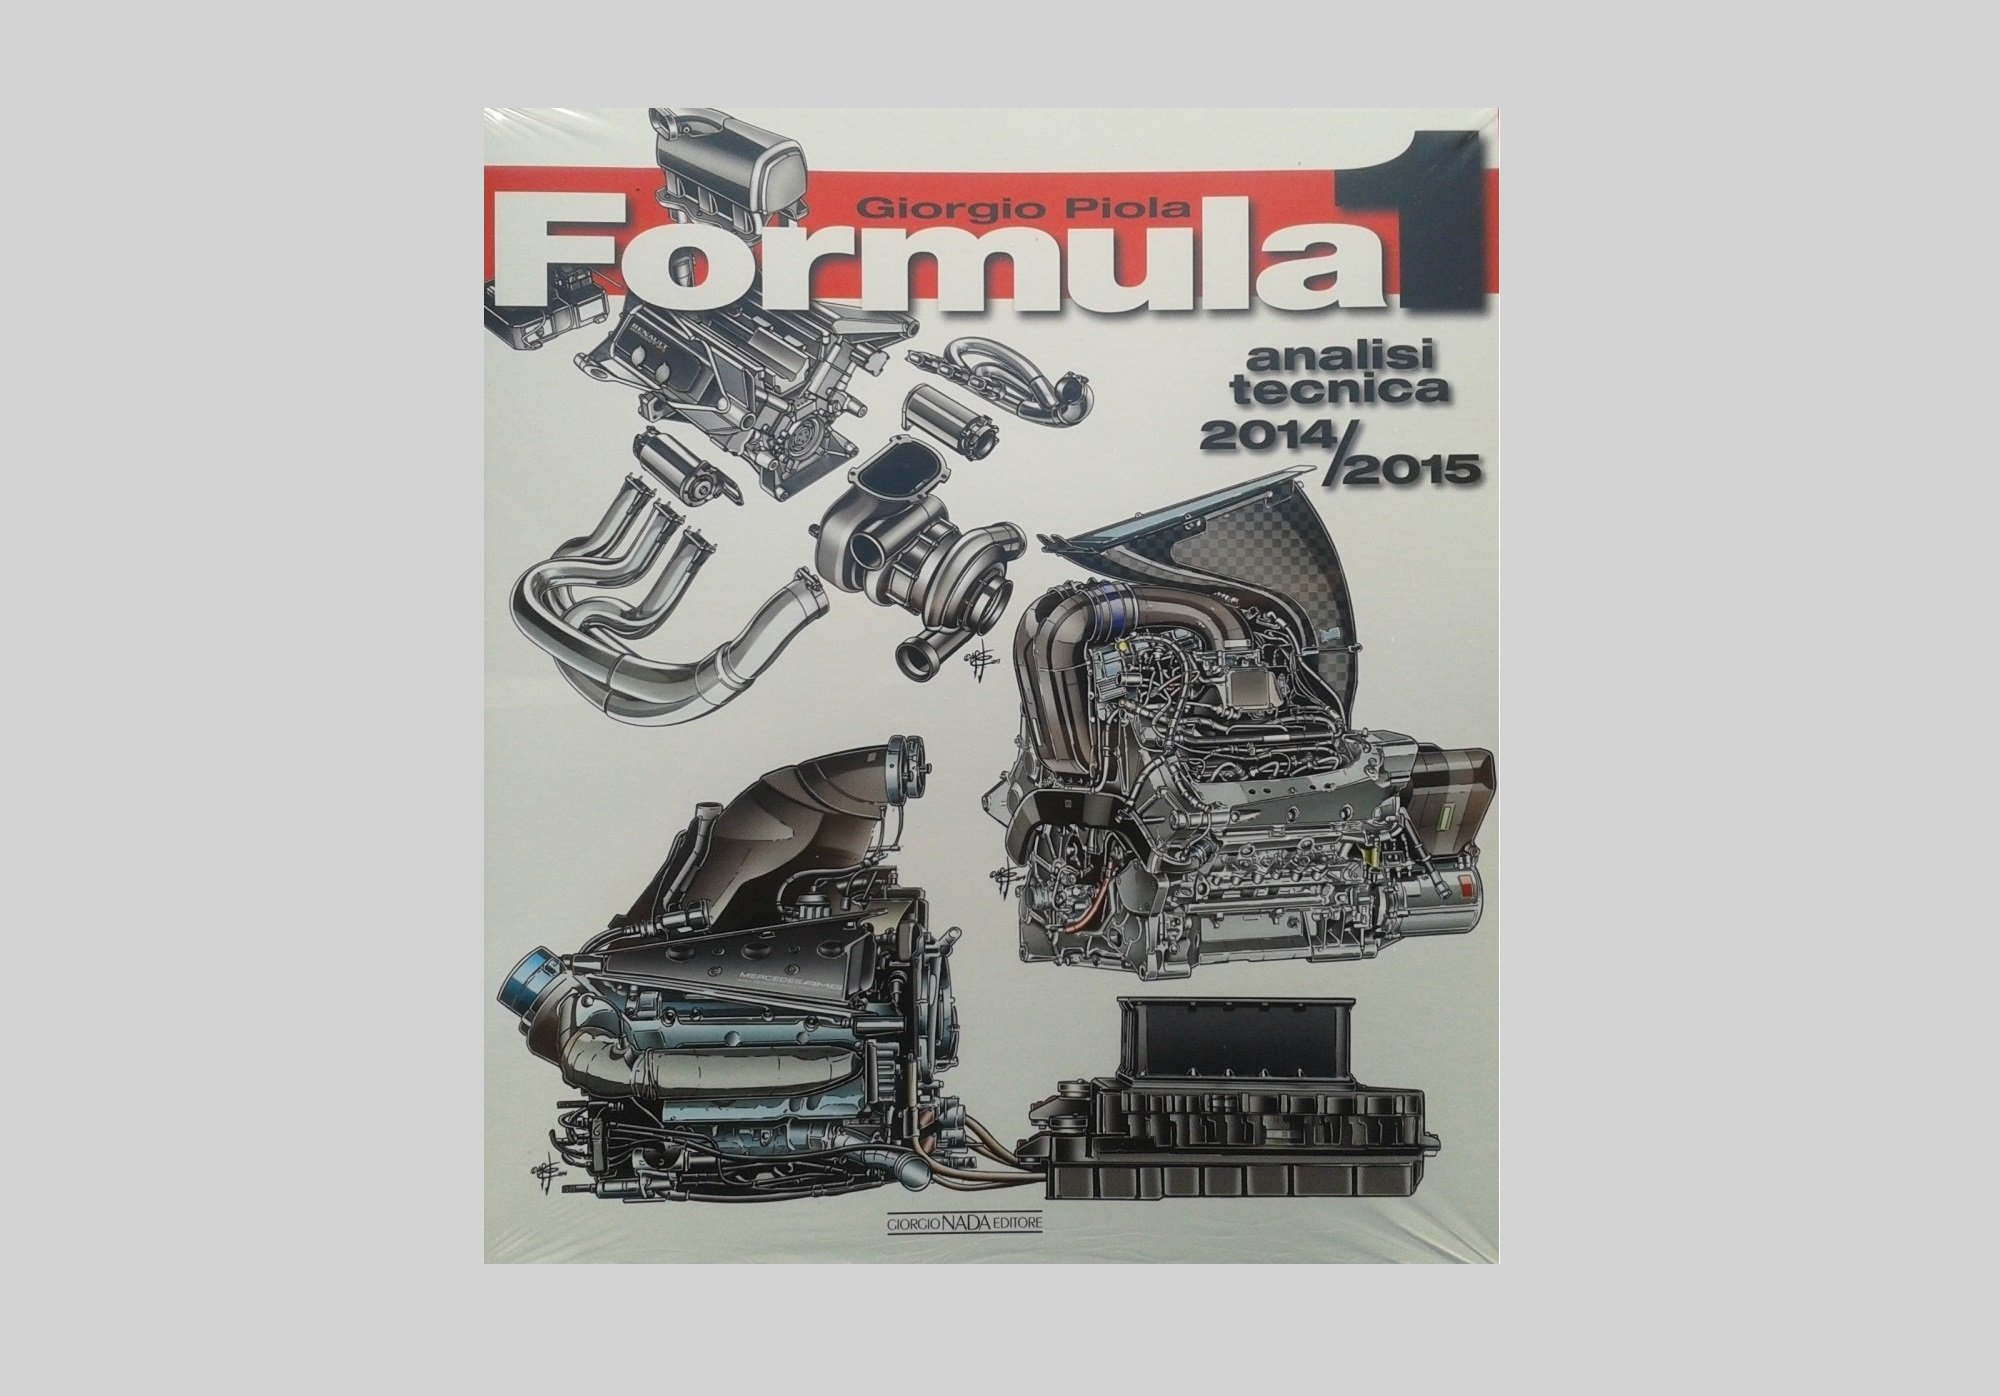 Formula 1 2014/2015 analisi tecnica